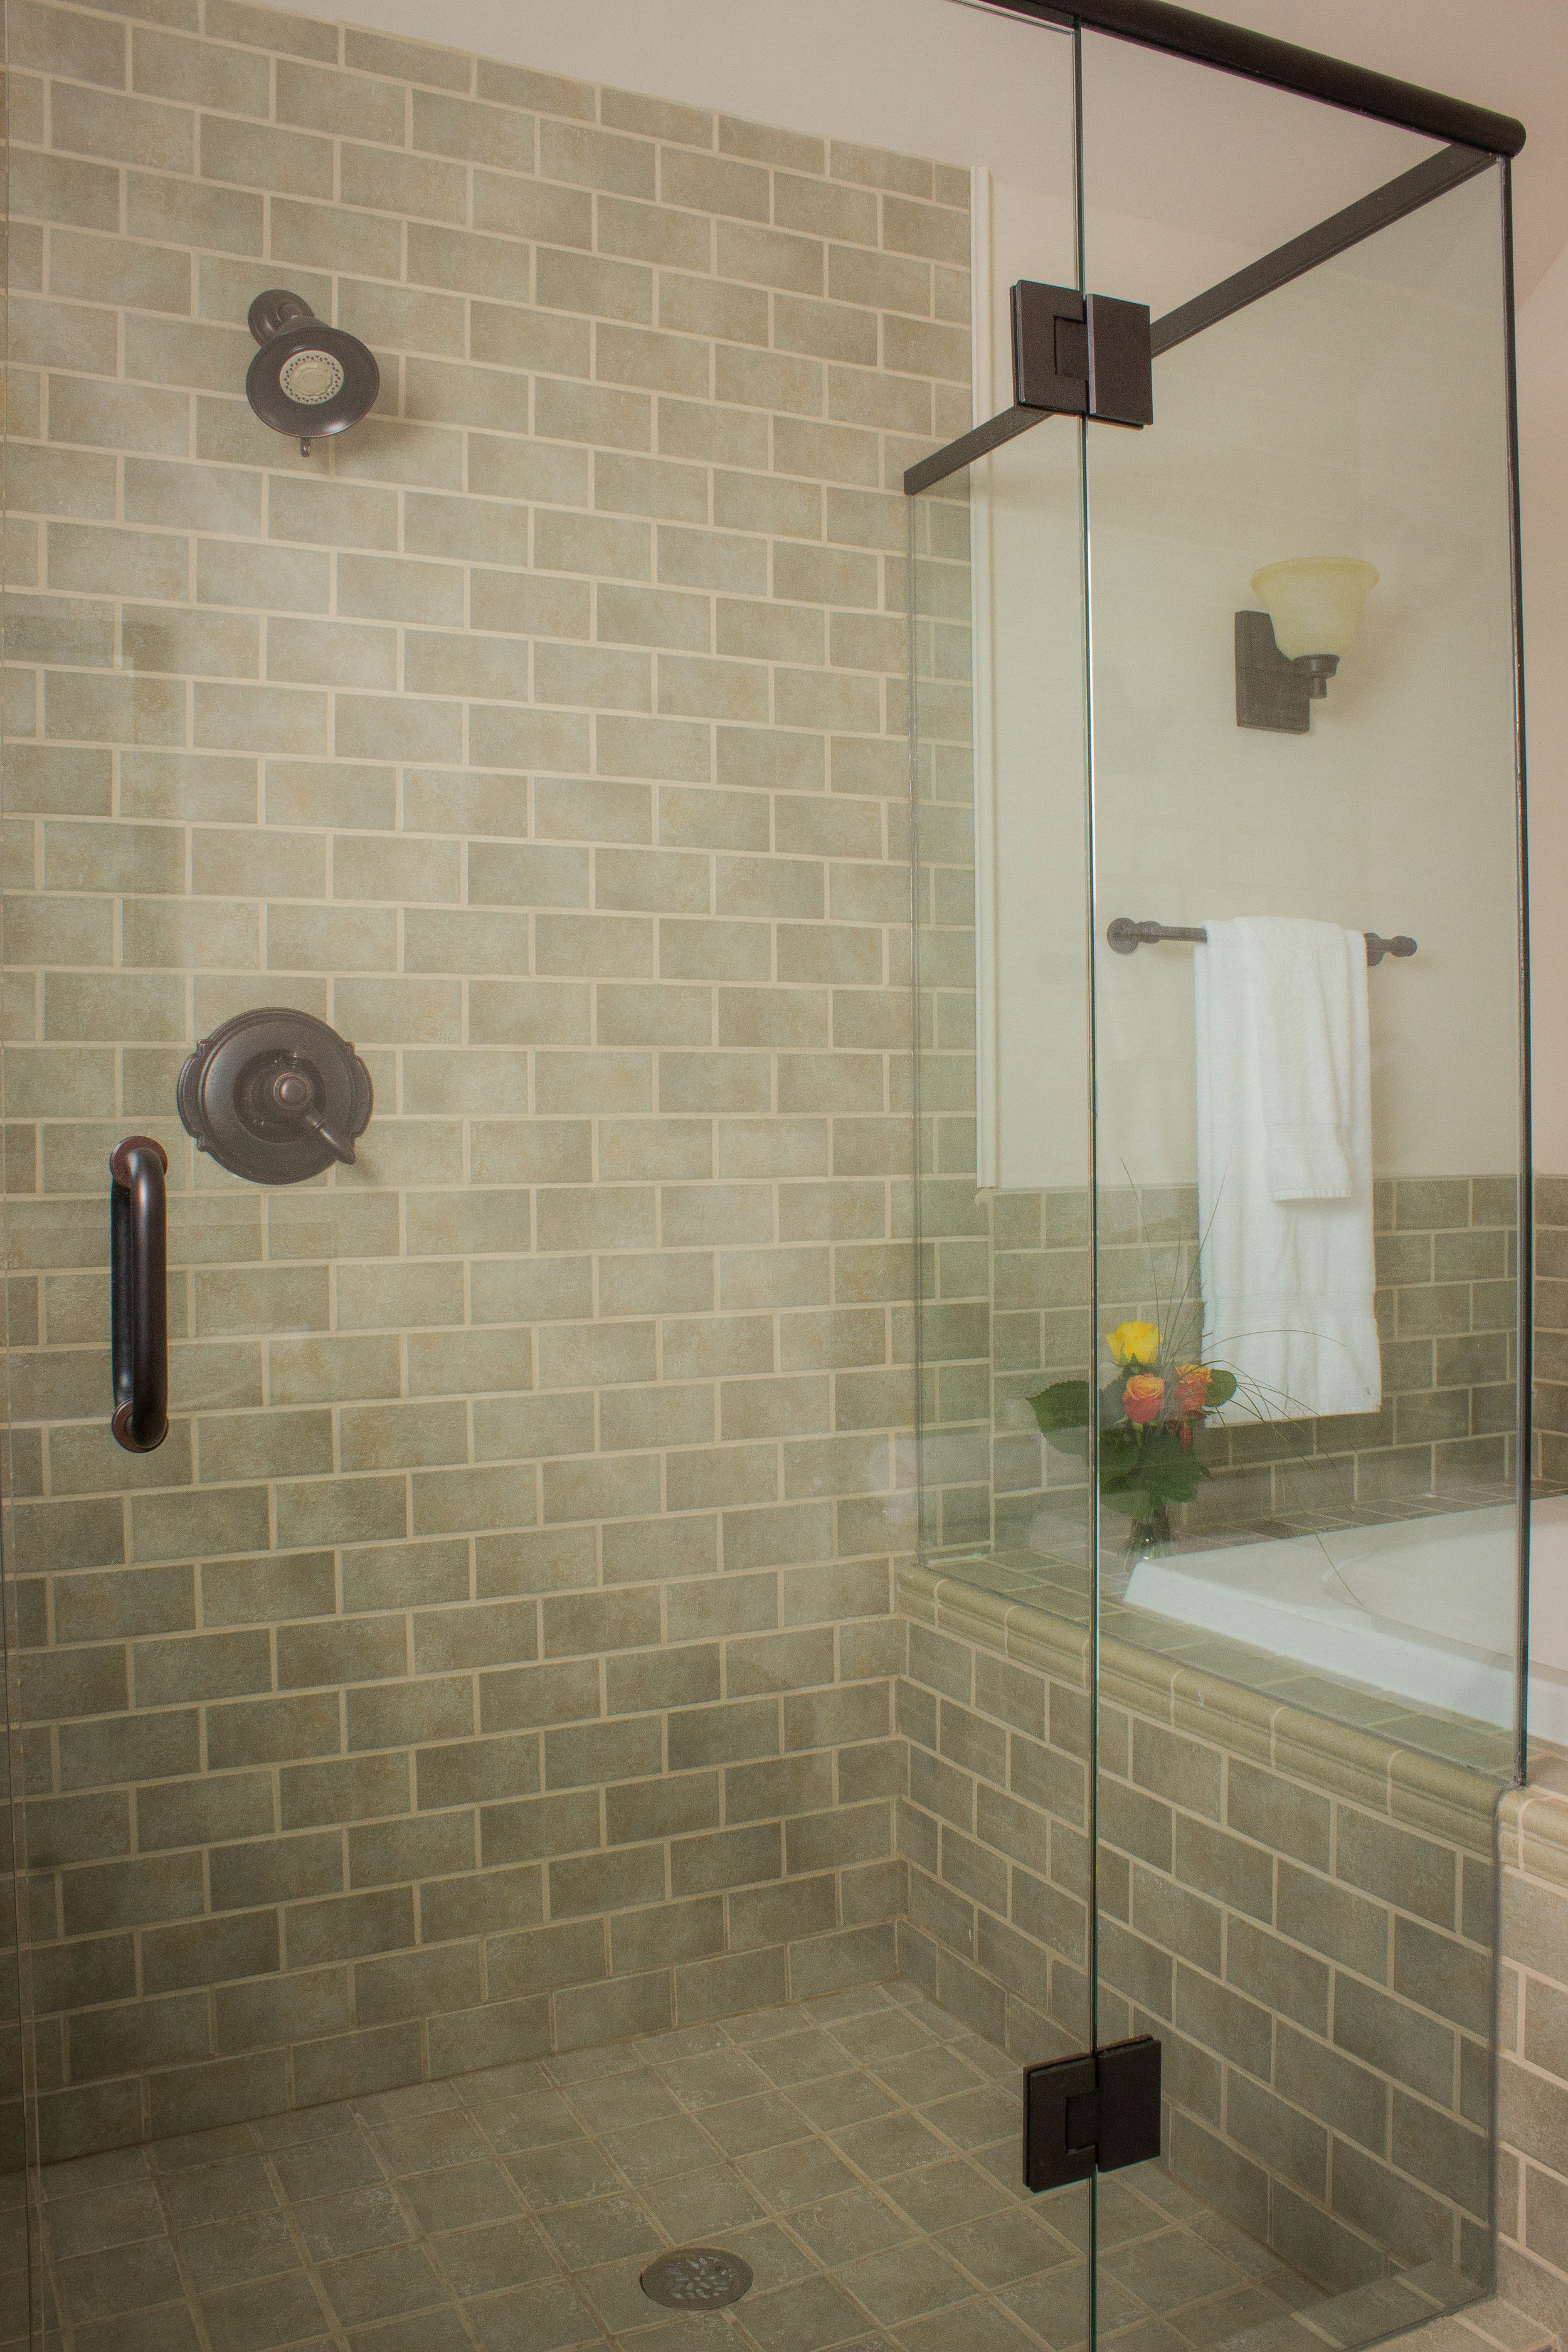 Extensive glass shower enclosures in bathrooms